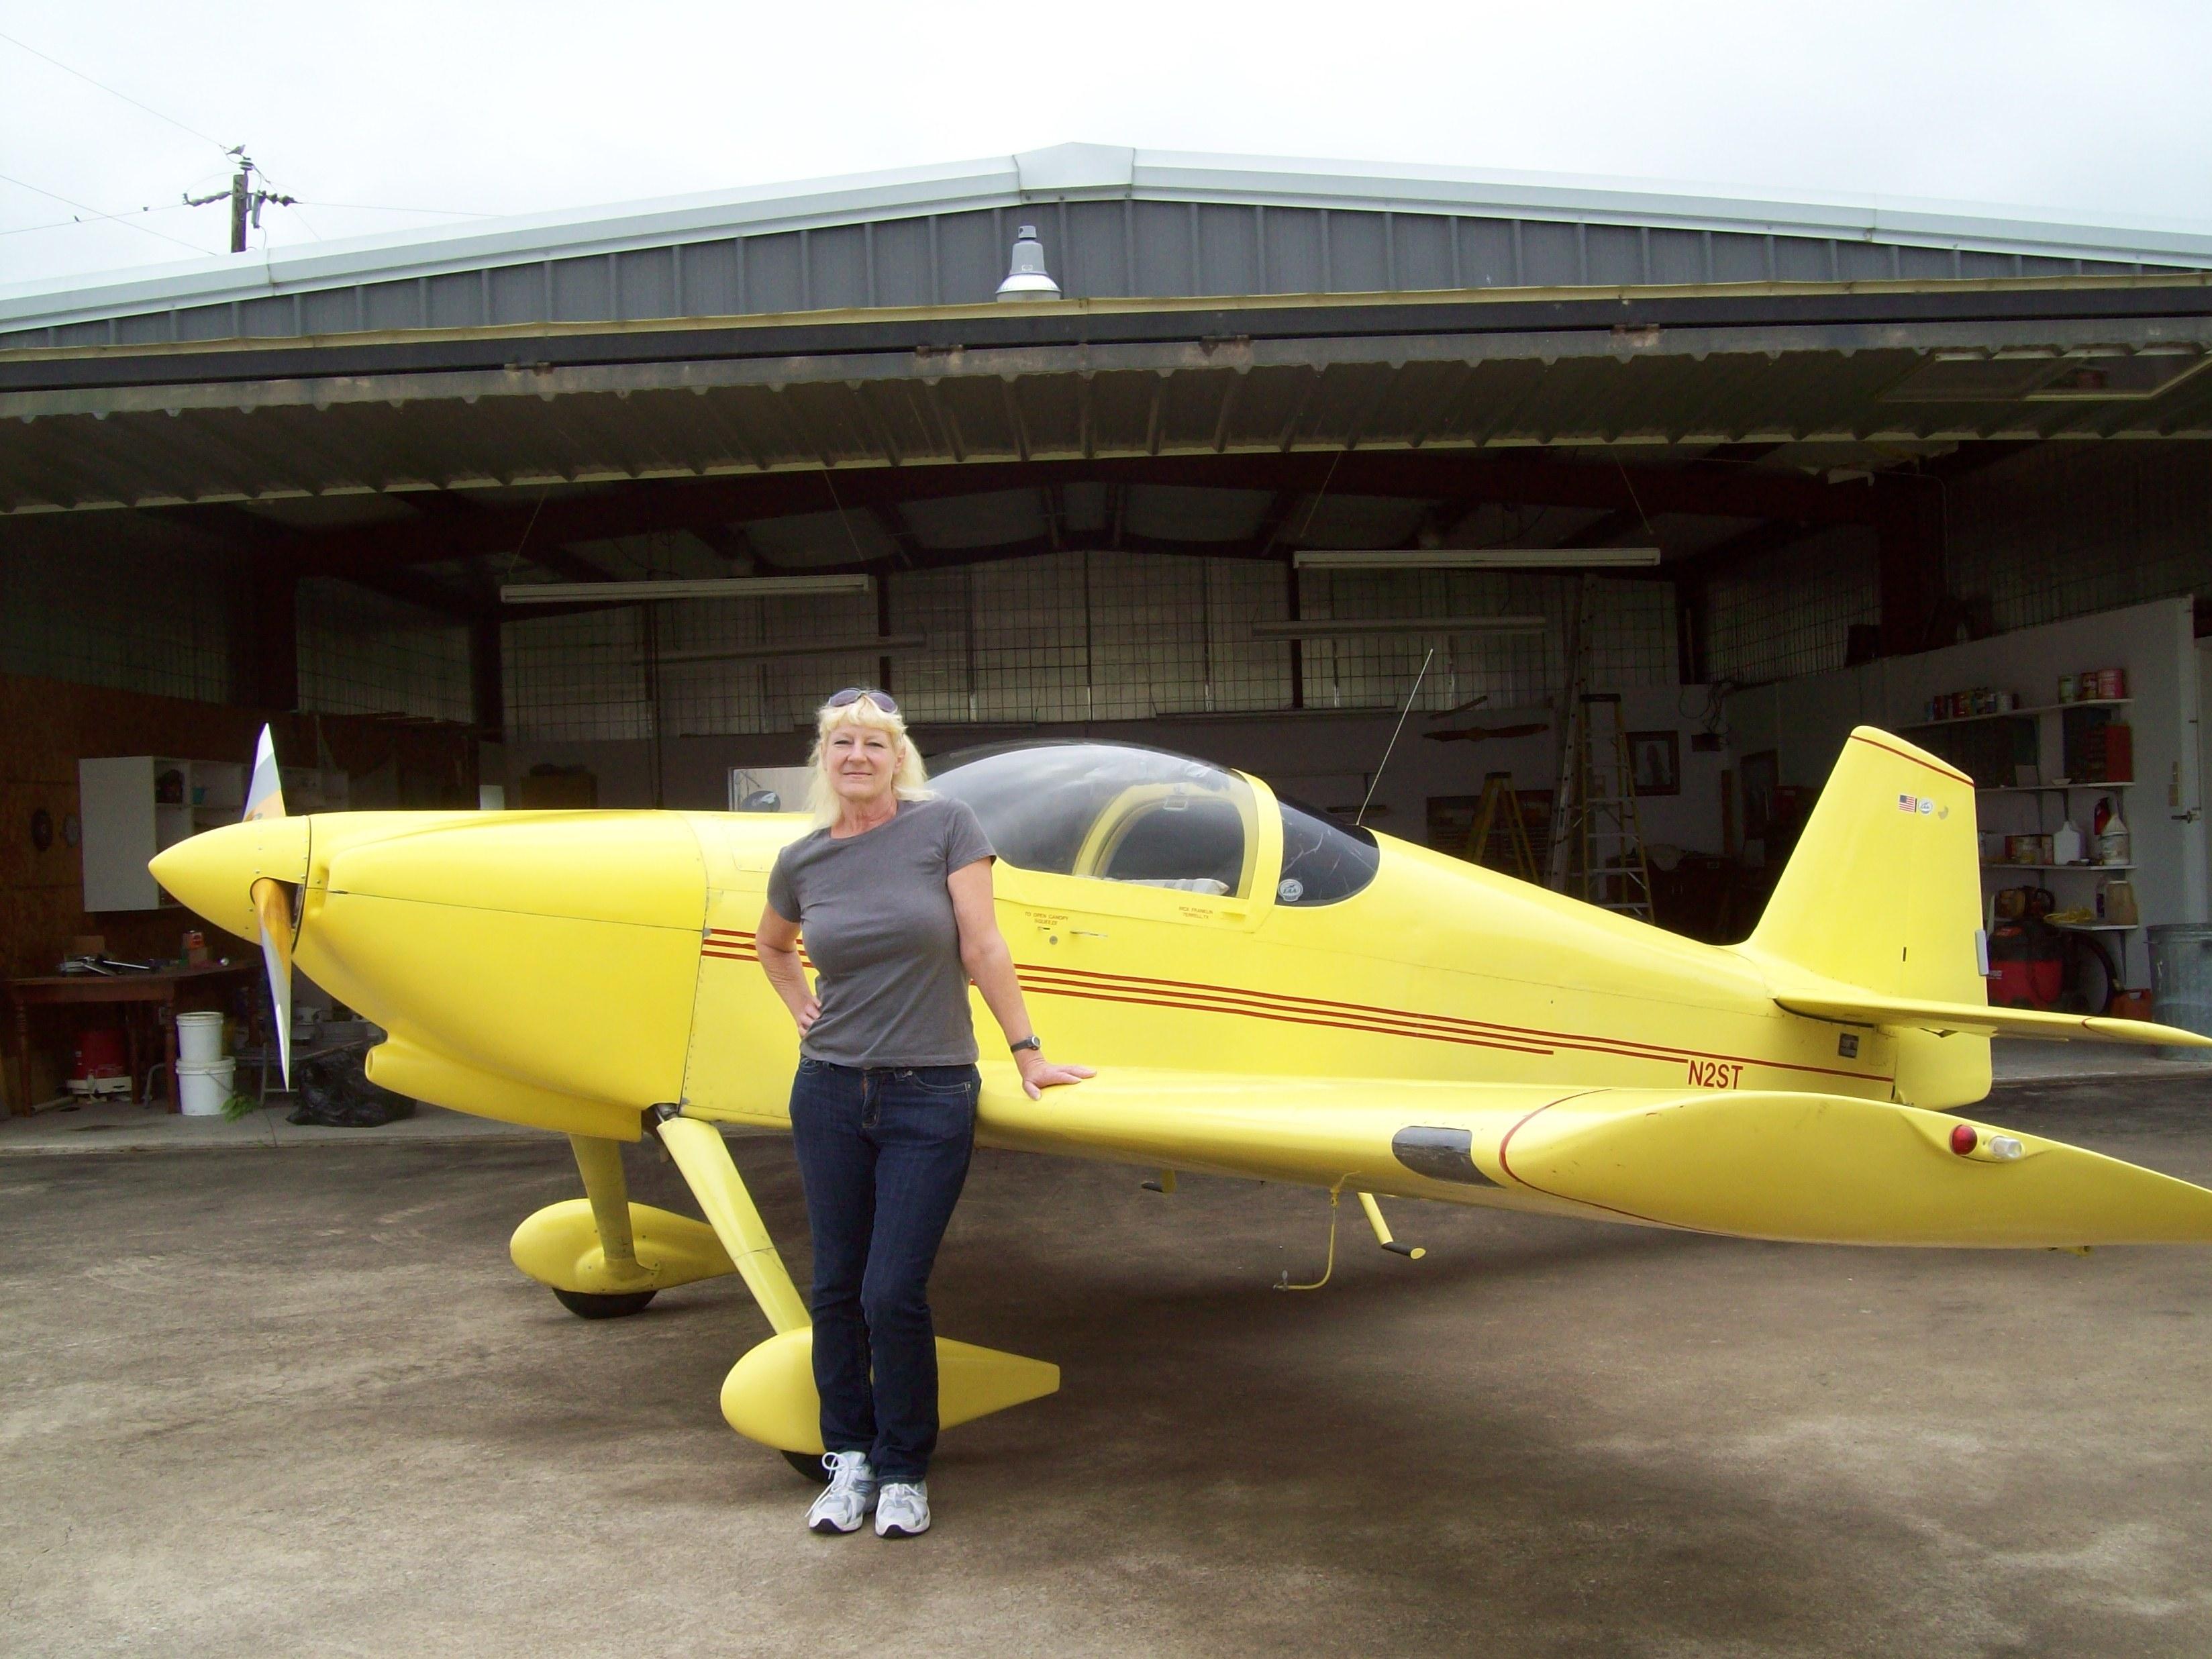 'Flying a Taildragger' by Gayla Maas